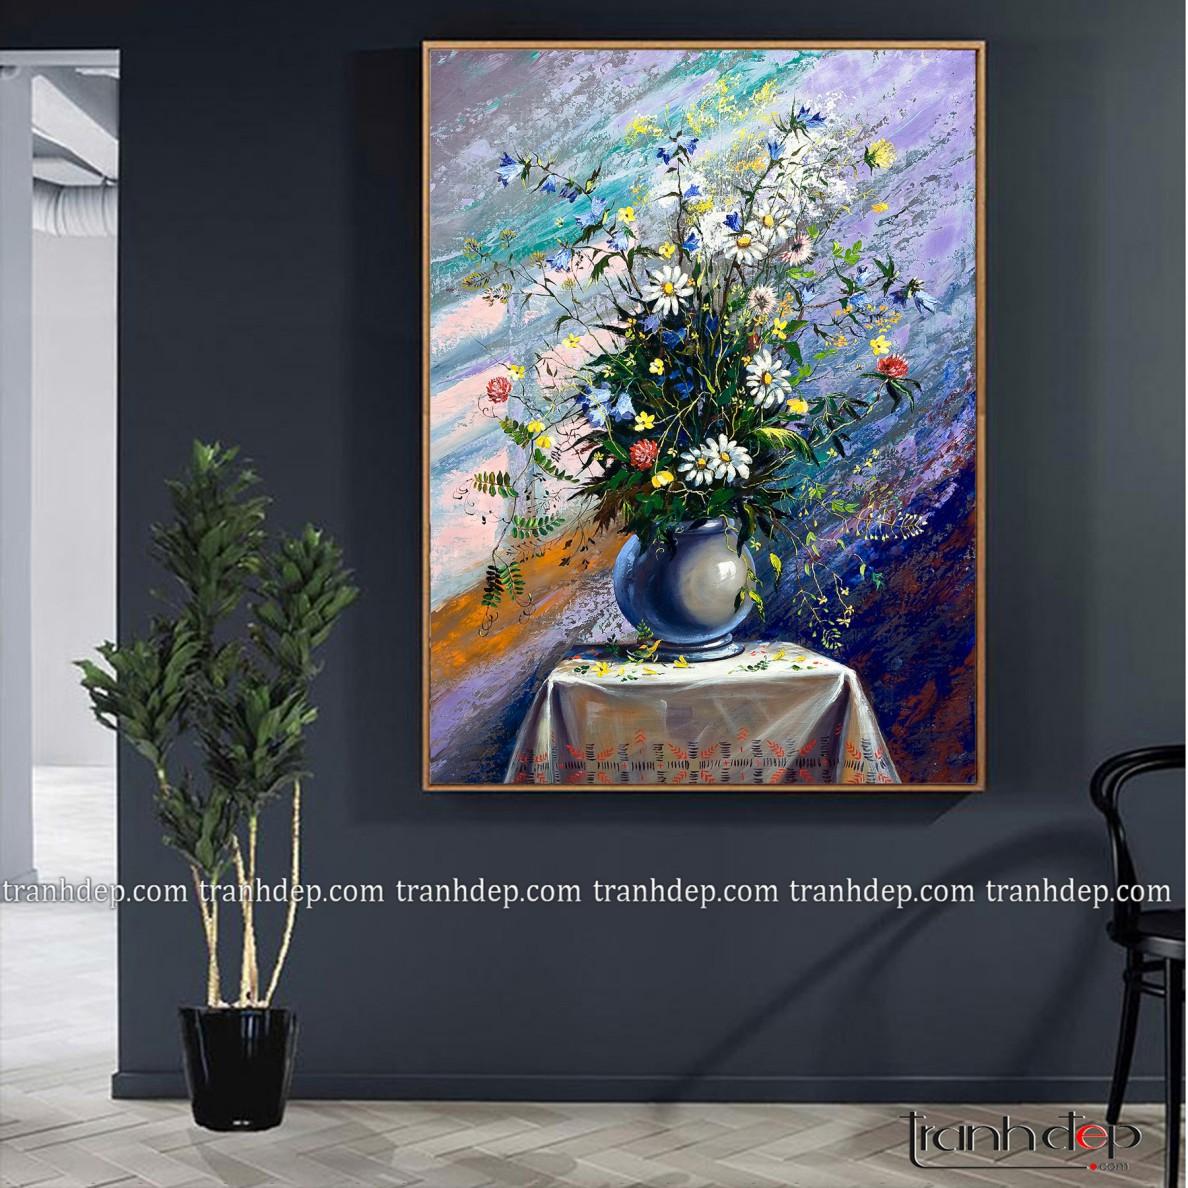 tranh tinh vat binh hoa cuc